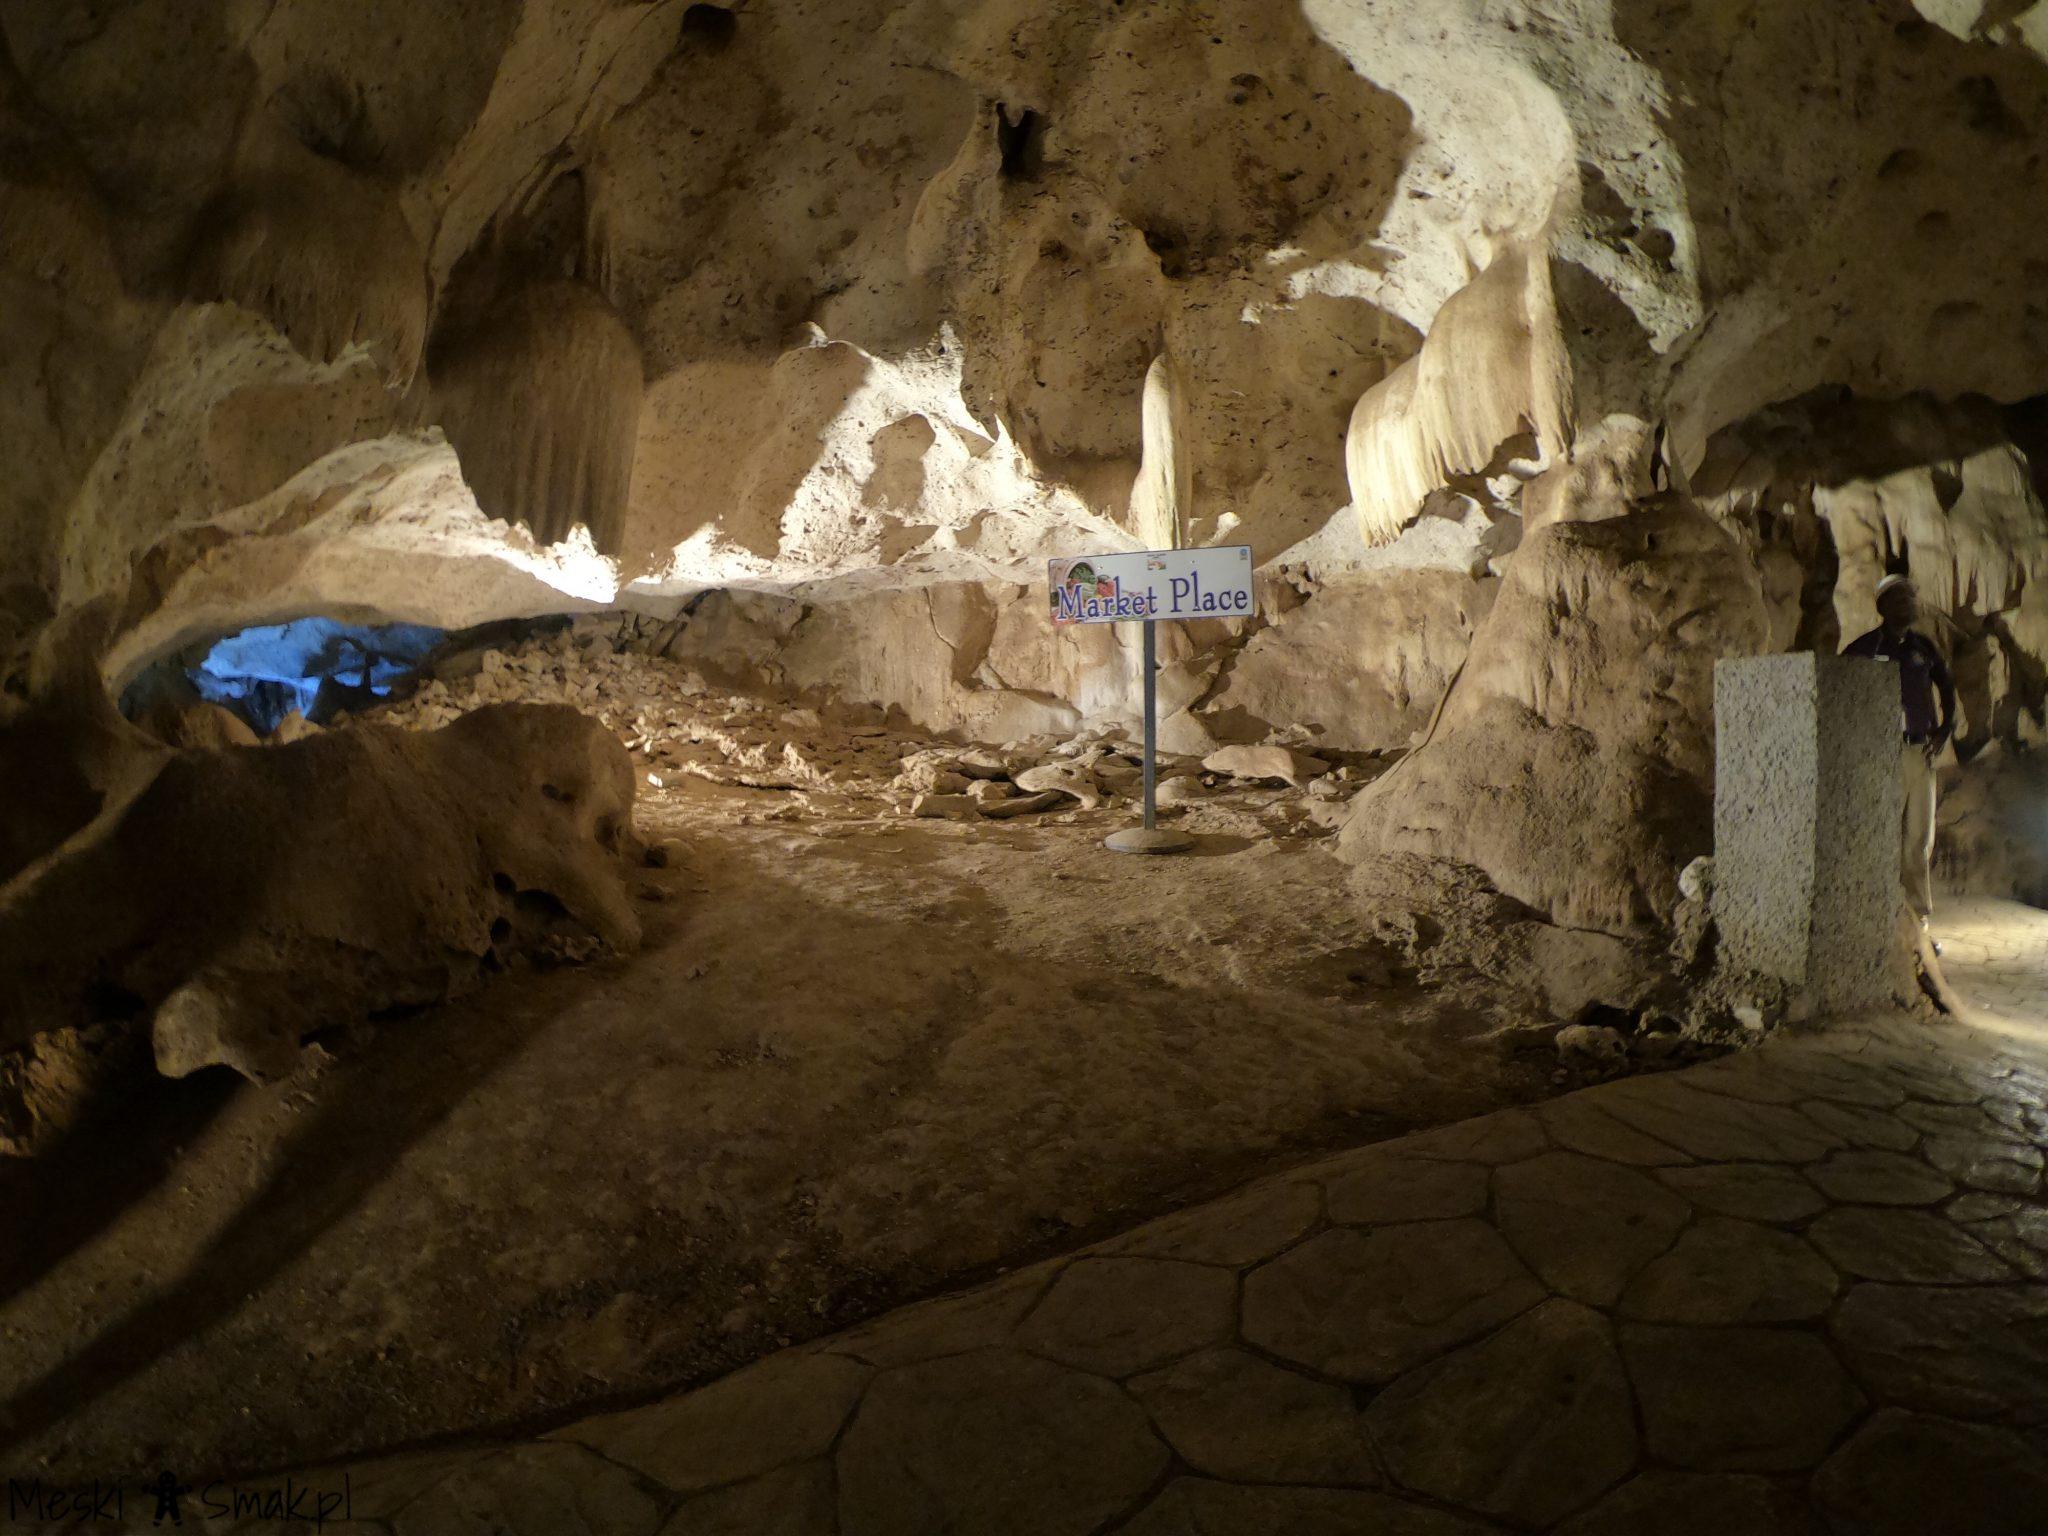 podróż poślubna_Green Grotto Caves 2